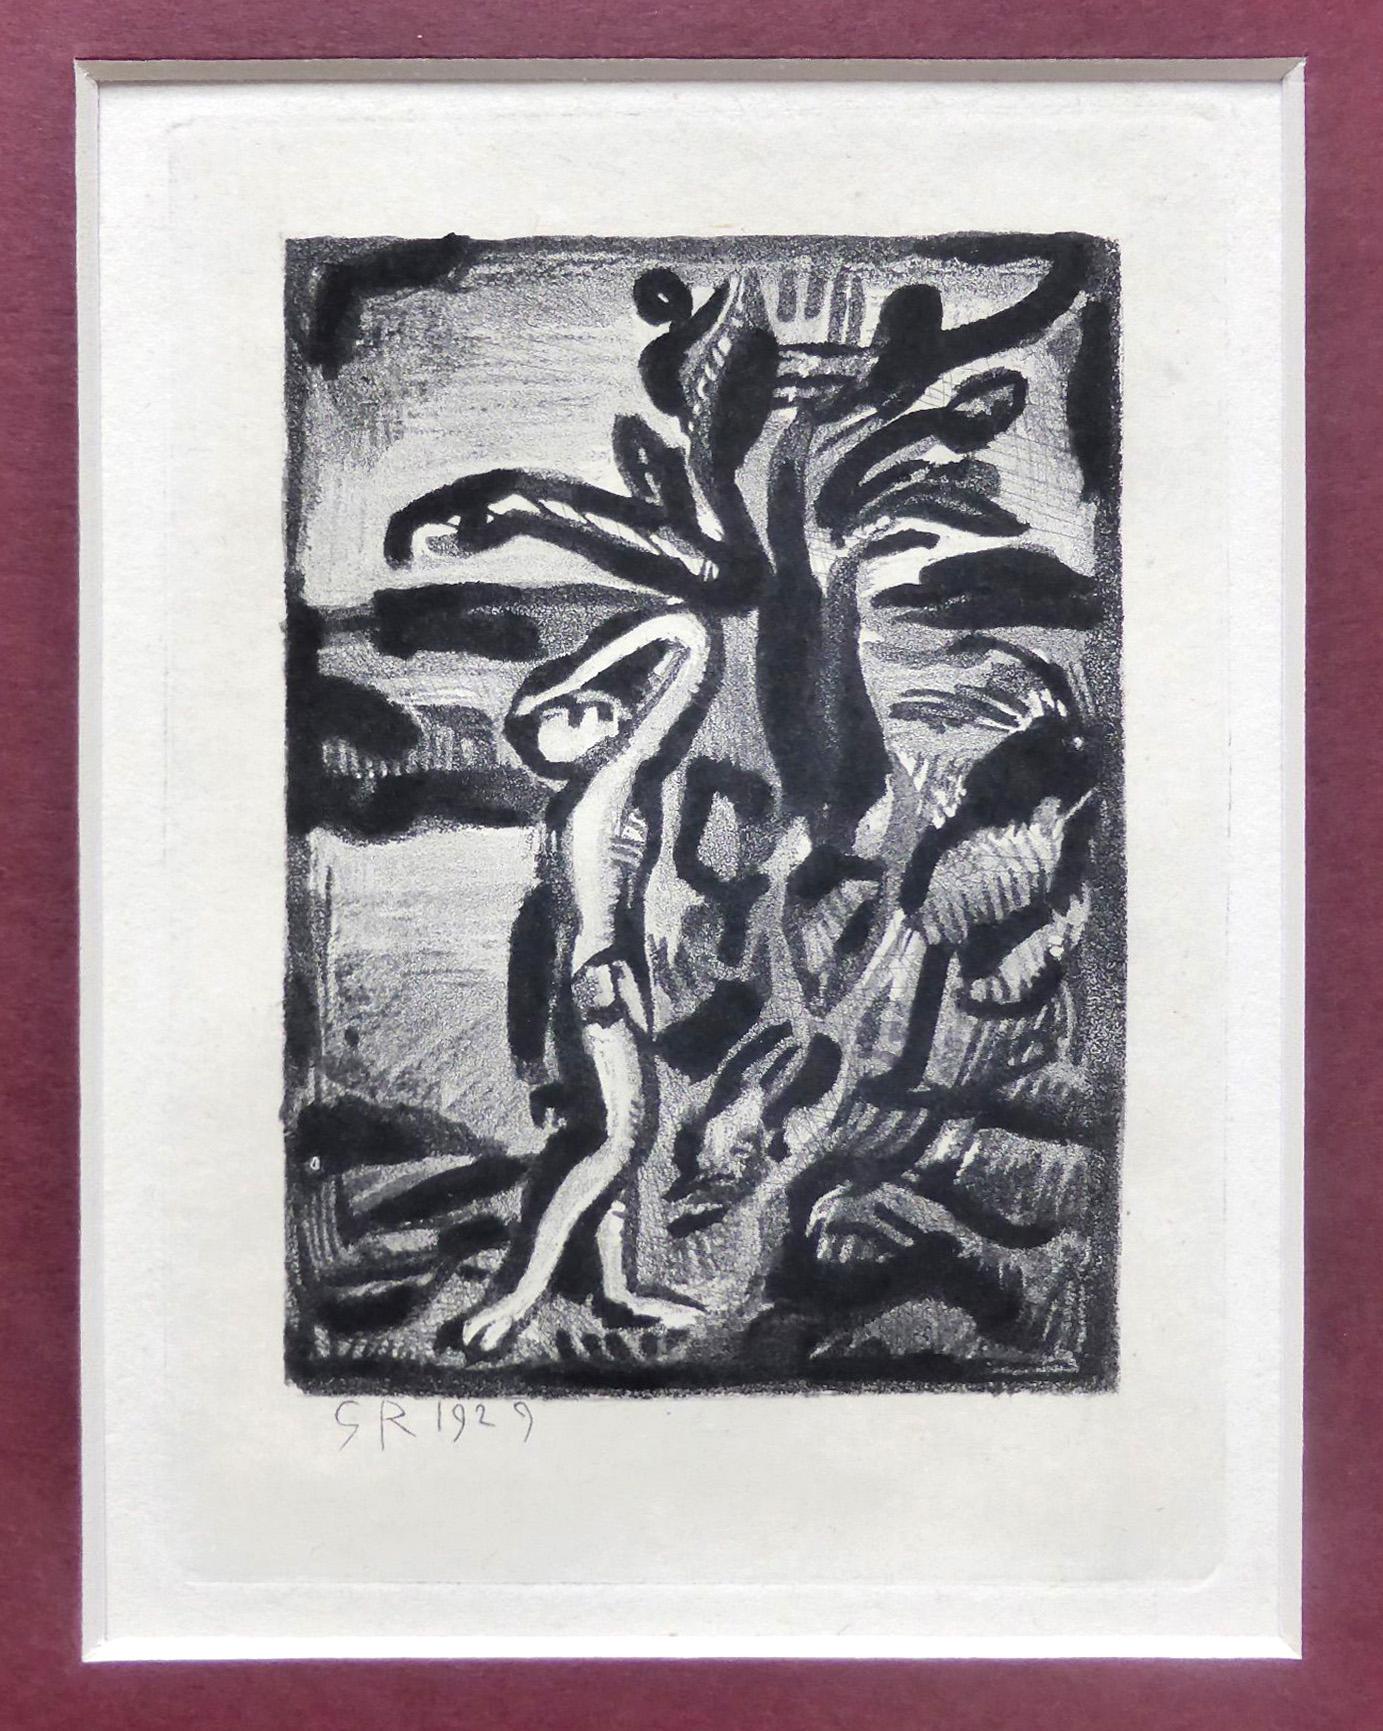 George Rouault Grafik, Reincarnation, Blatt 21, 1929